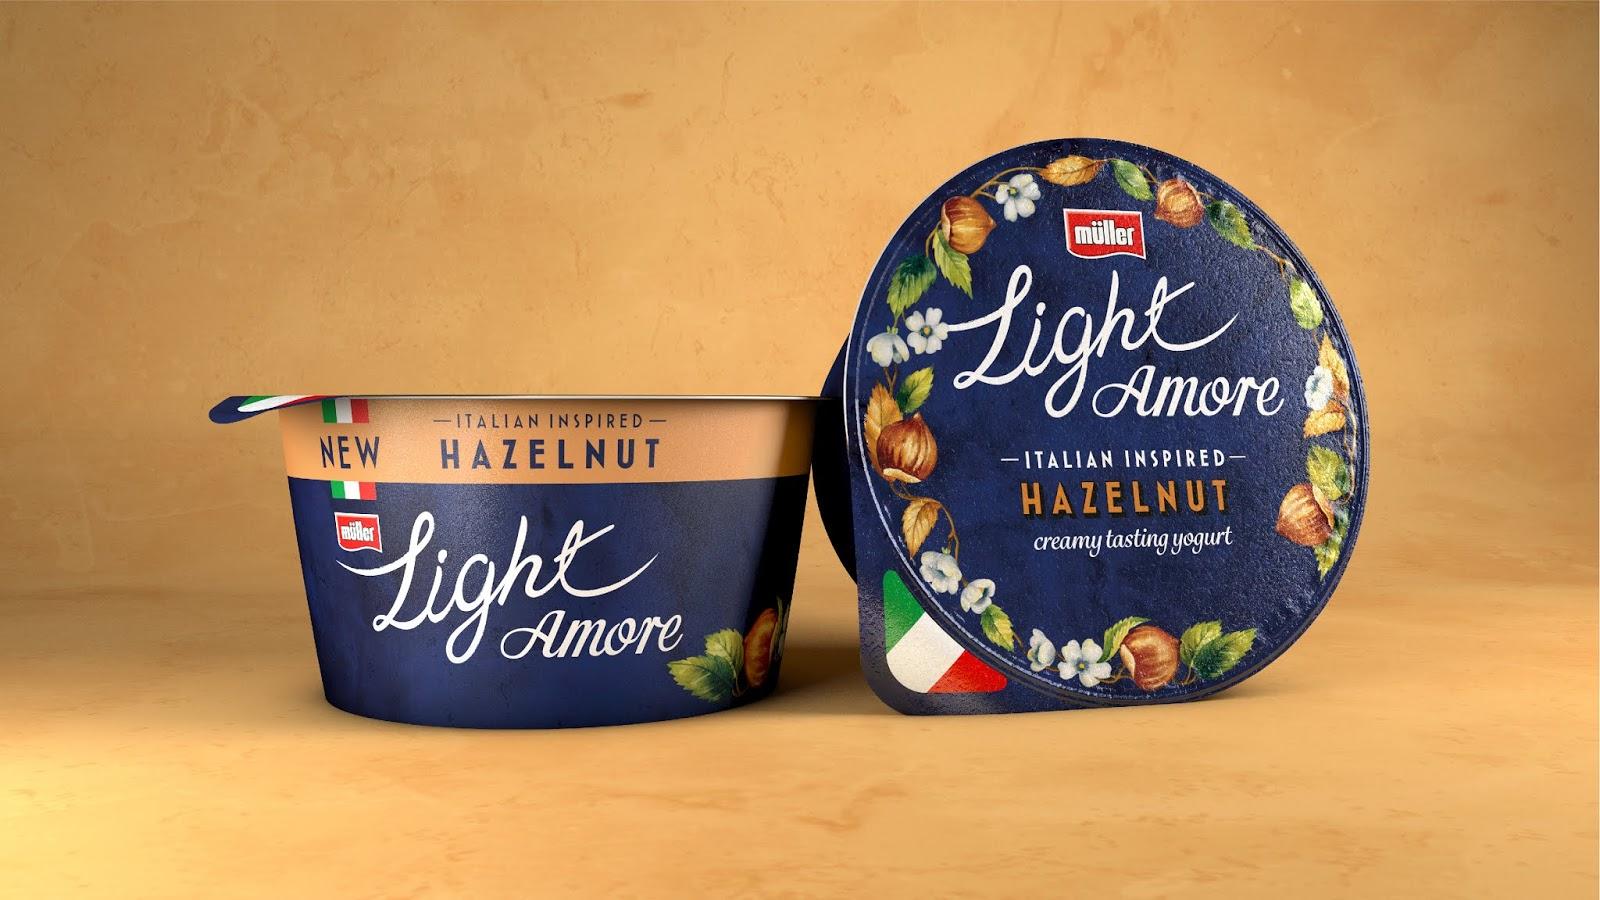 Muller Light Amore意大利风格酸奶包装设计